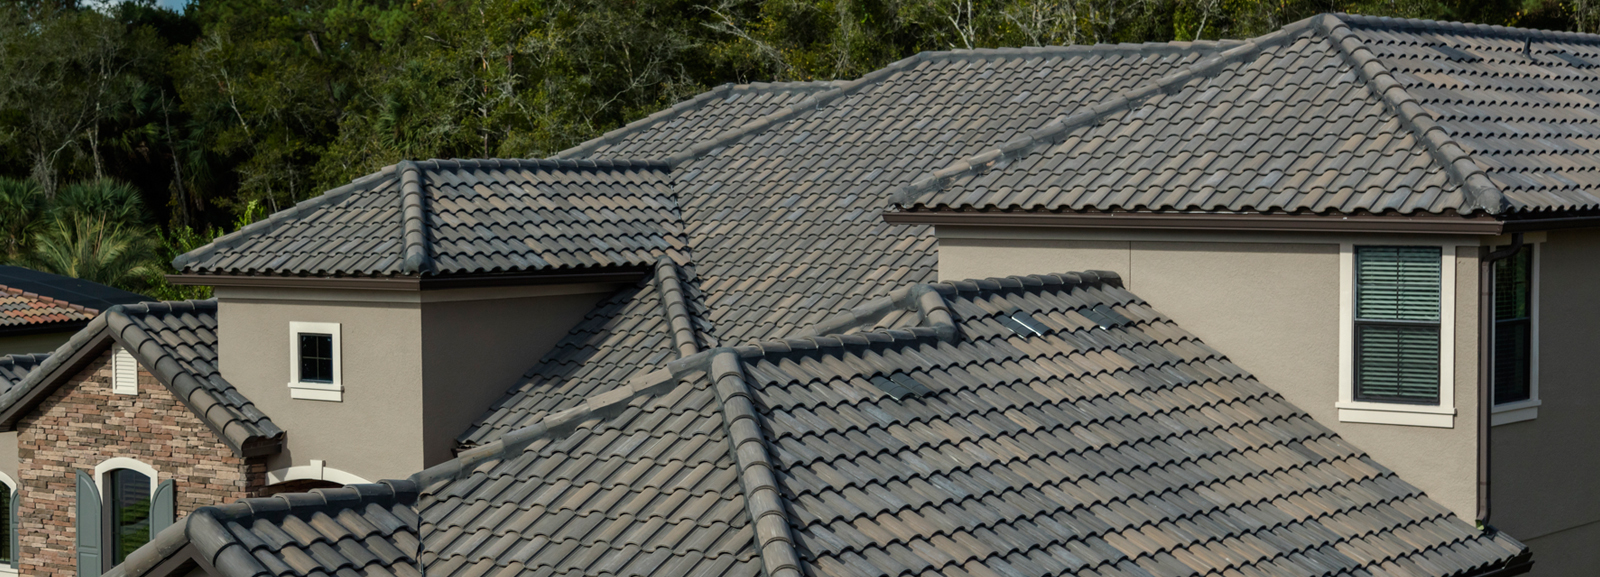 Naples Roofing Contractor | Naples Roofer | Naples Roofing Company | Naples Roof Contractor | Naples Roofing Estimate